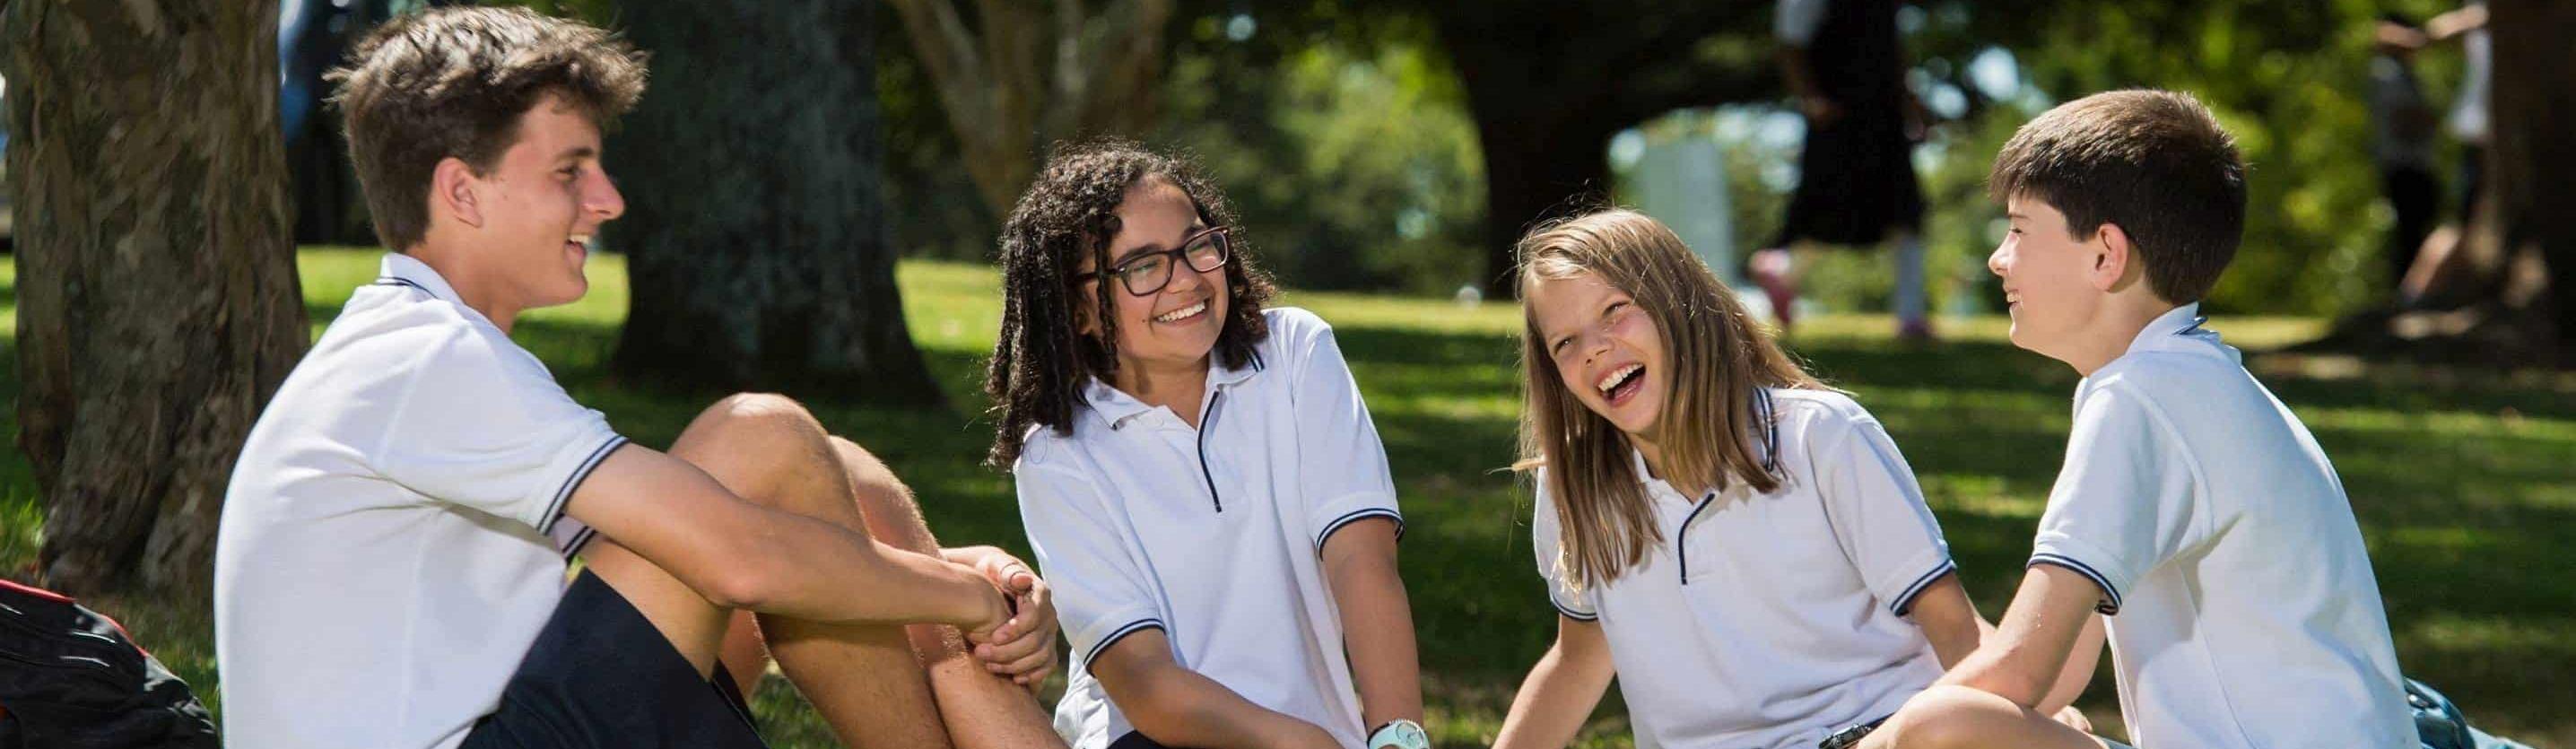 Kostenfreier High School Neuseeland Service